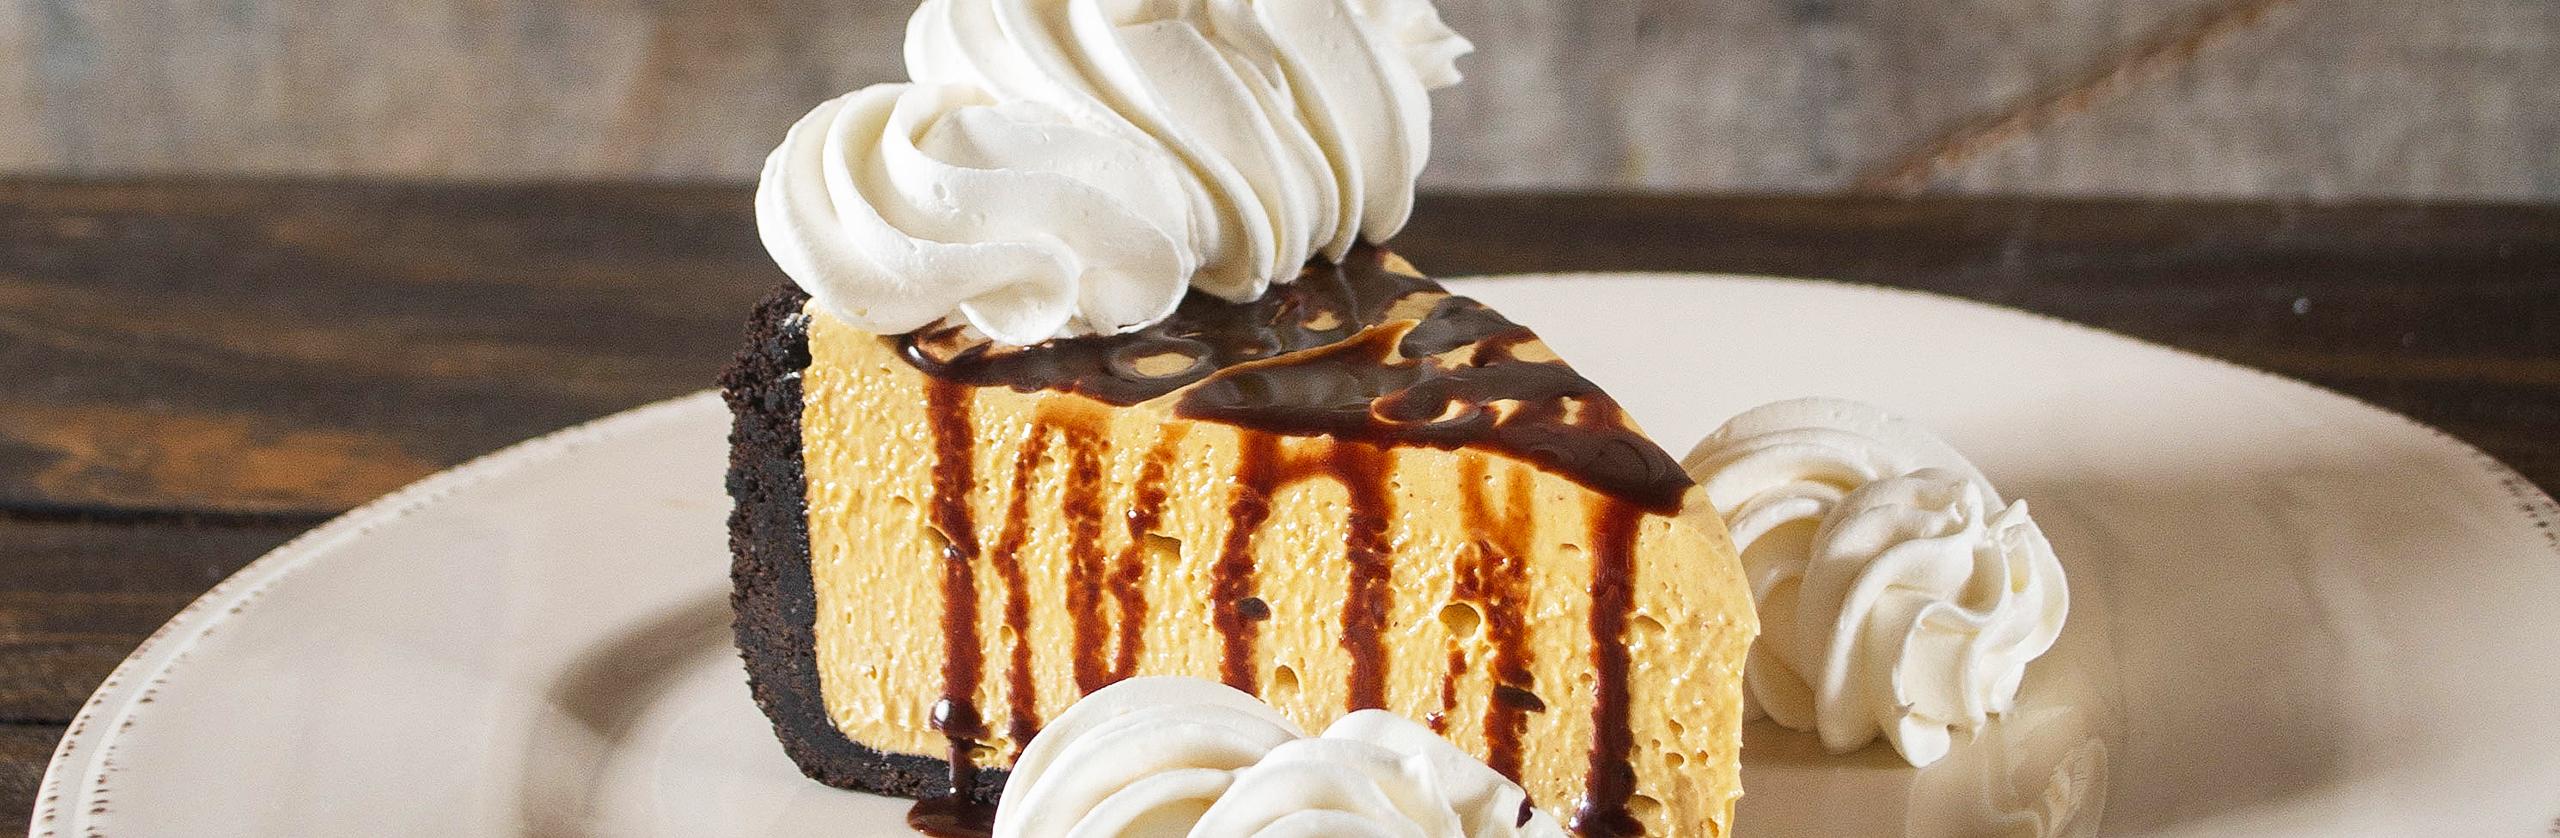 Dessert Menu | The Mill in Hershey